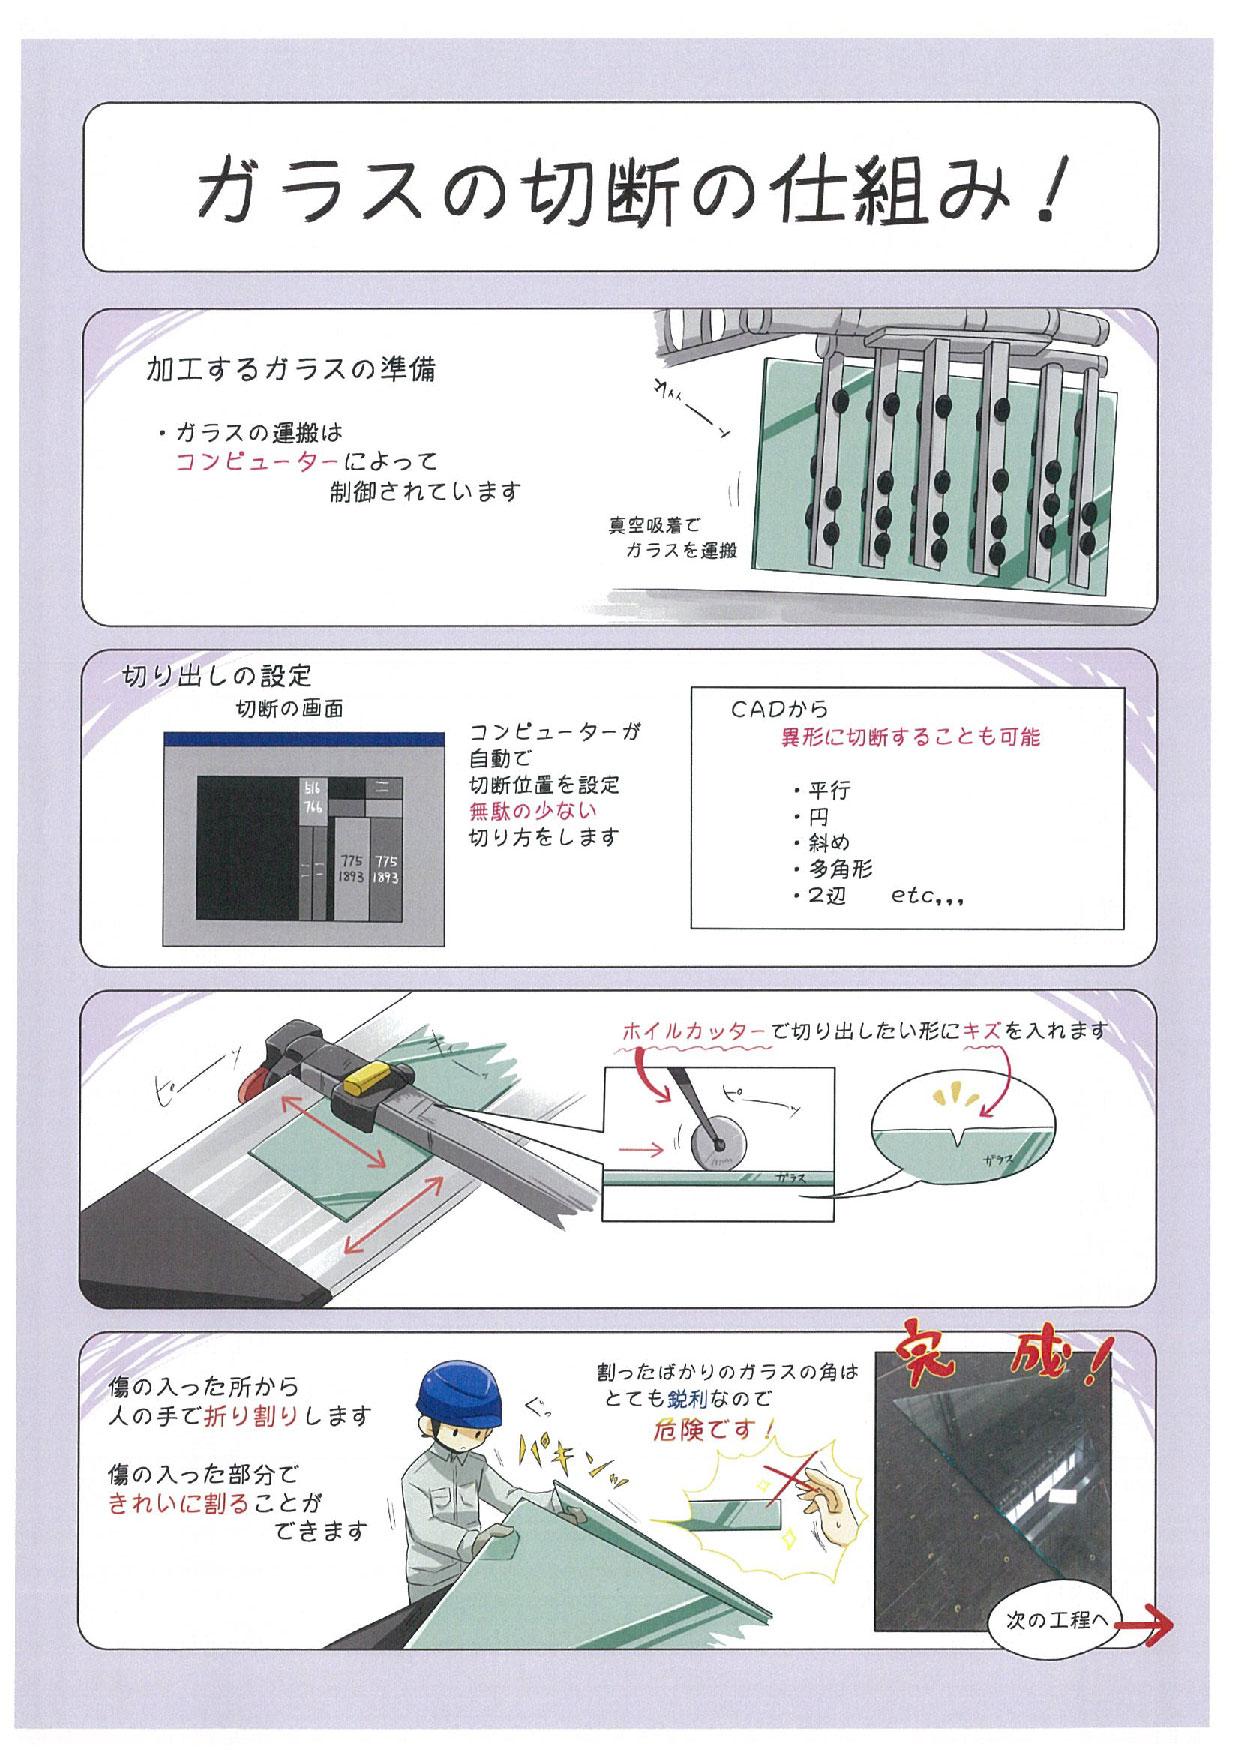 https://www.sanshiba-g.co.jp/images/setubi/Cut.jpg